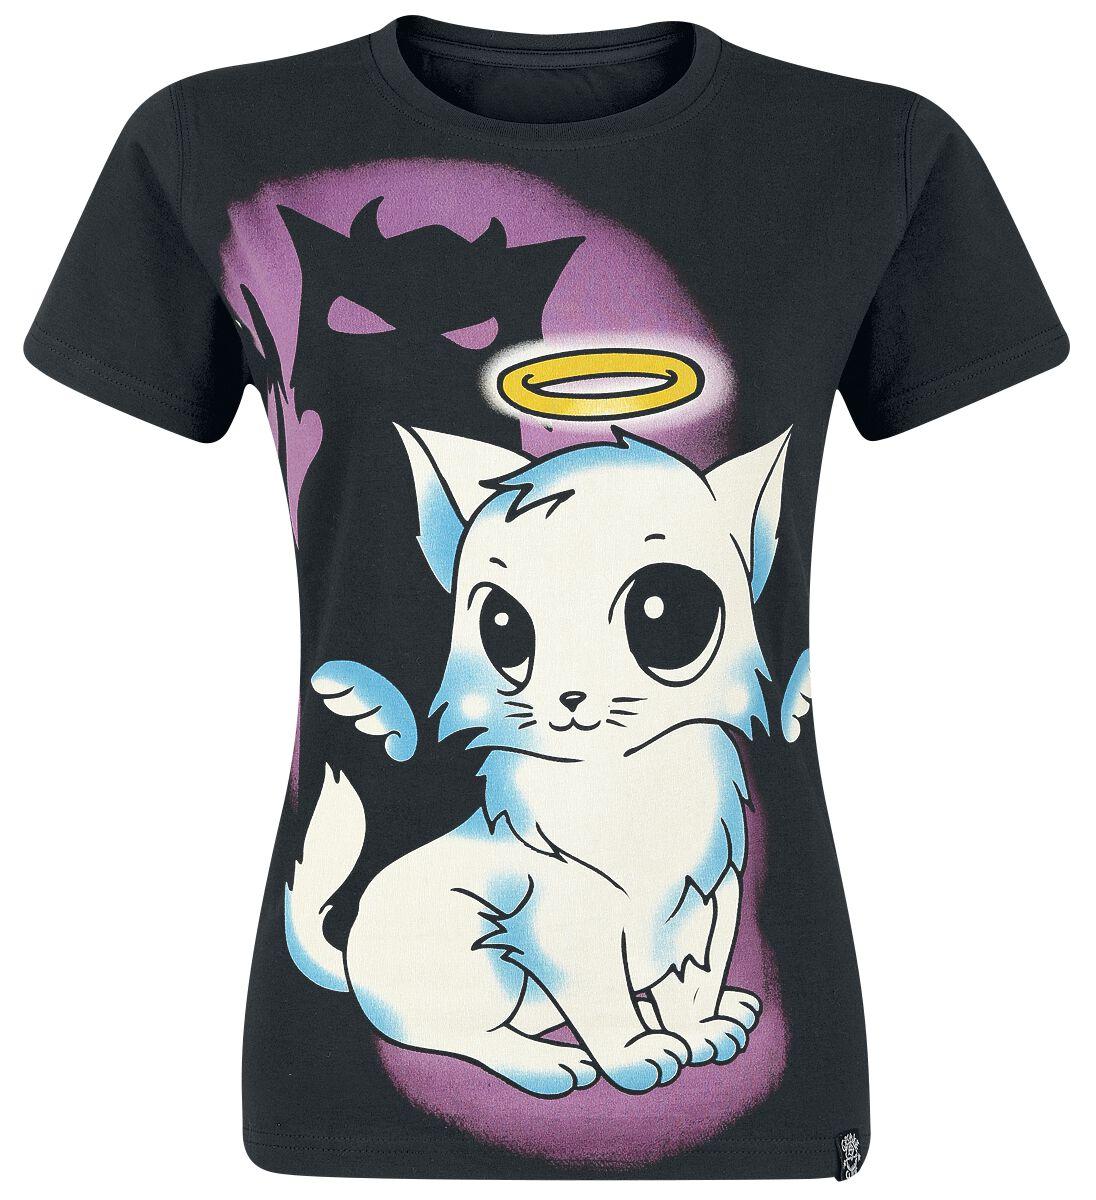 Marki - Koszulki - Koszulka damska Innocent Kitty Angel T Koszulka damska czarny - 370973